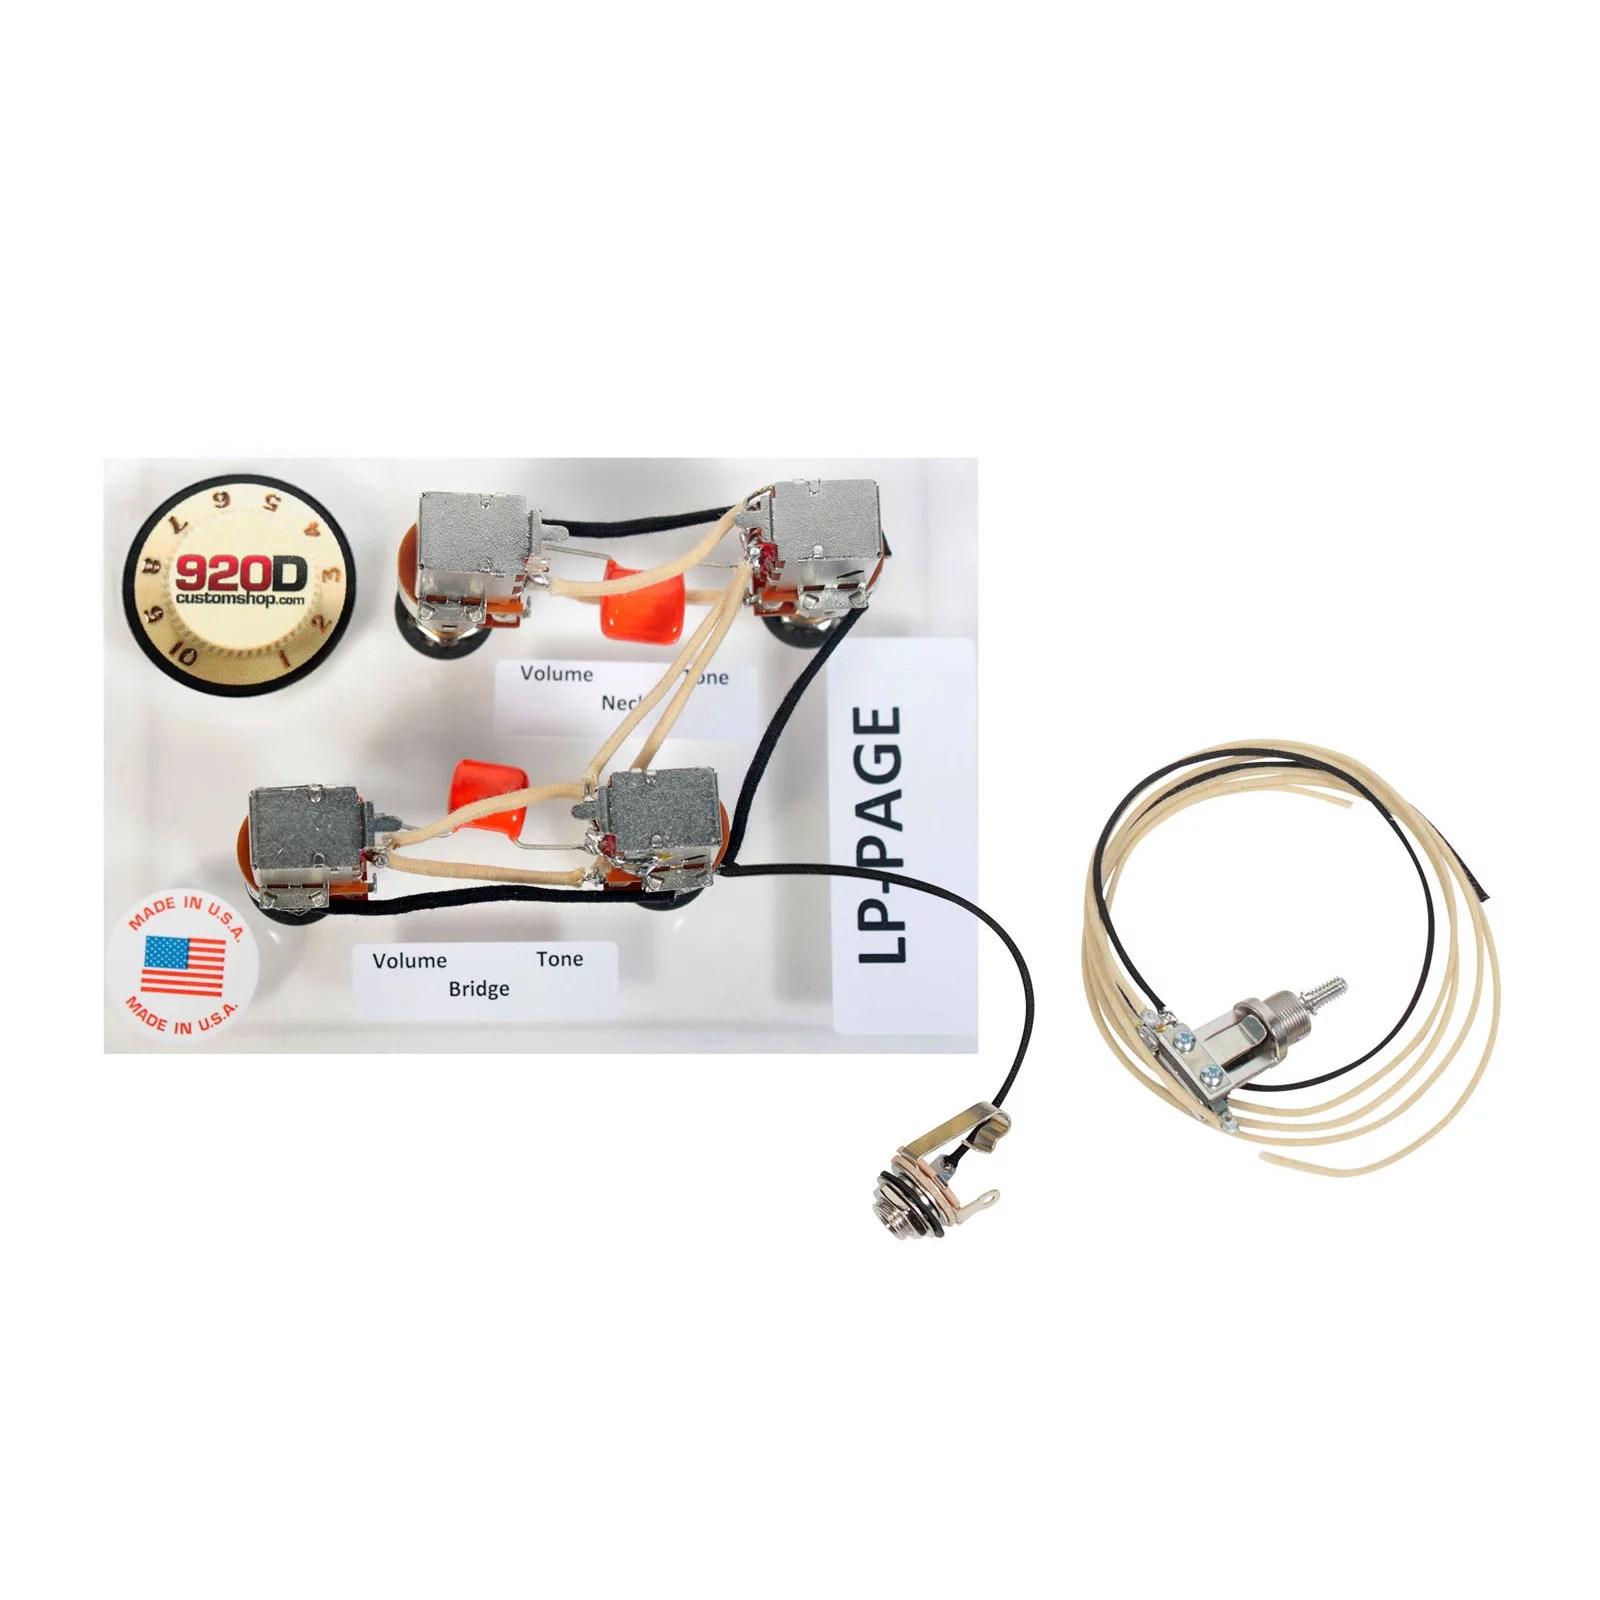 920d custom shop les paul jimmy page wiring harness w switchcraft jimmy page wiring harness sg [ 1600 x 1600 Pixel ]